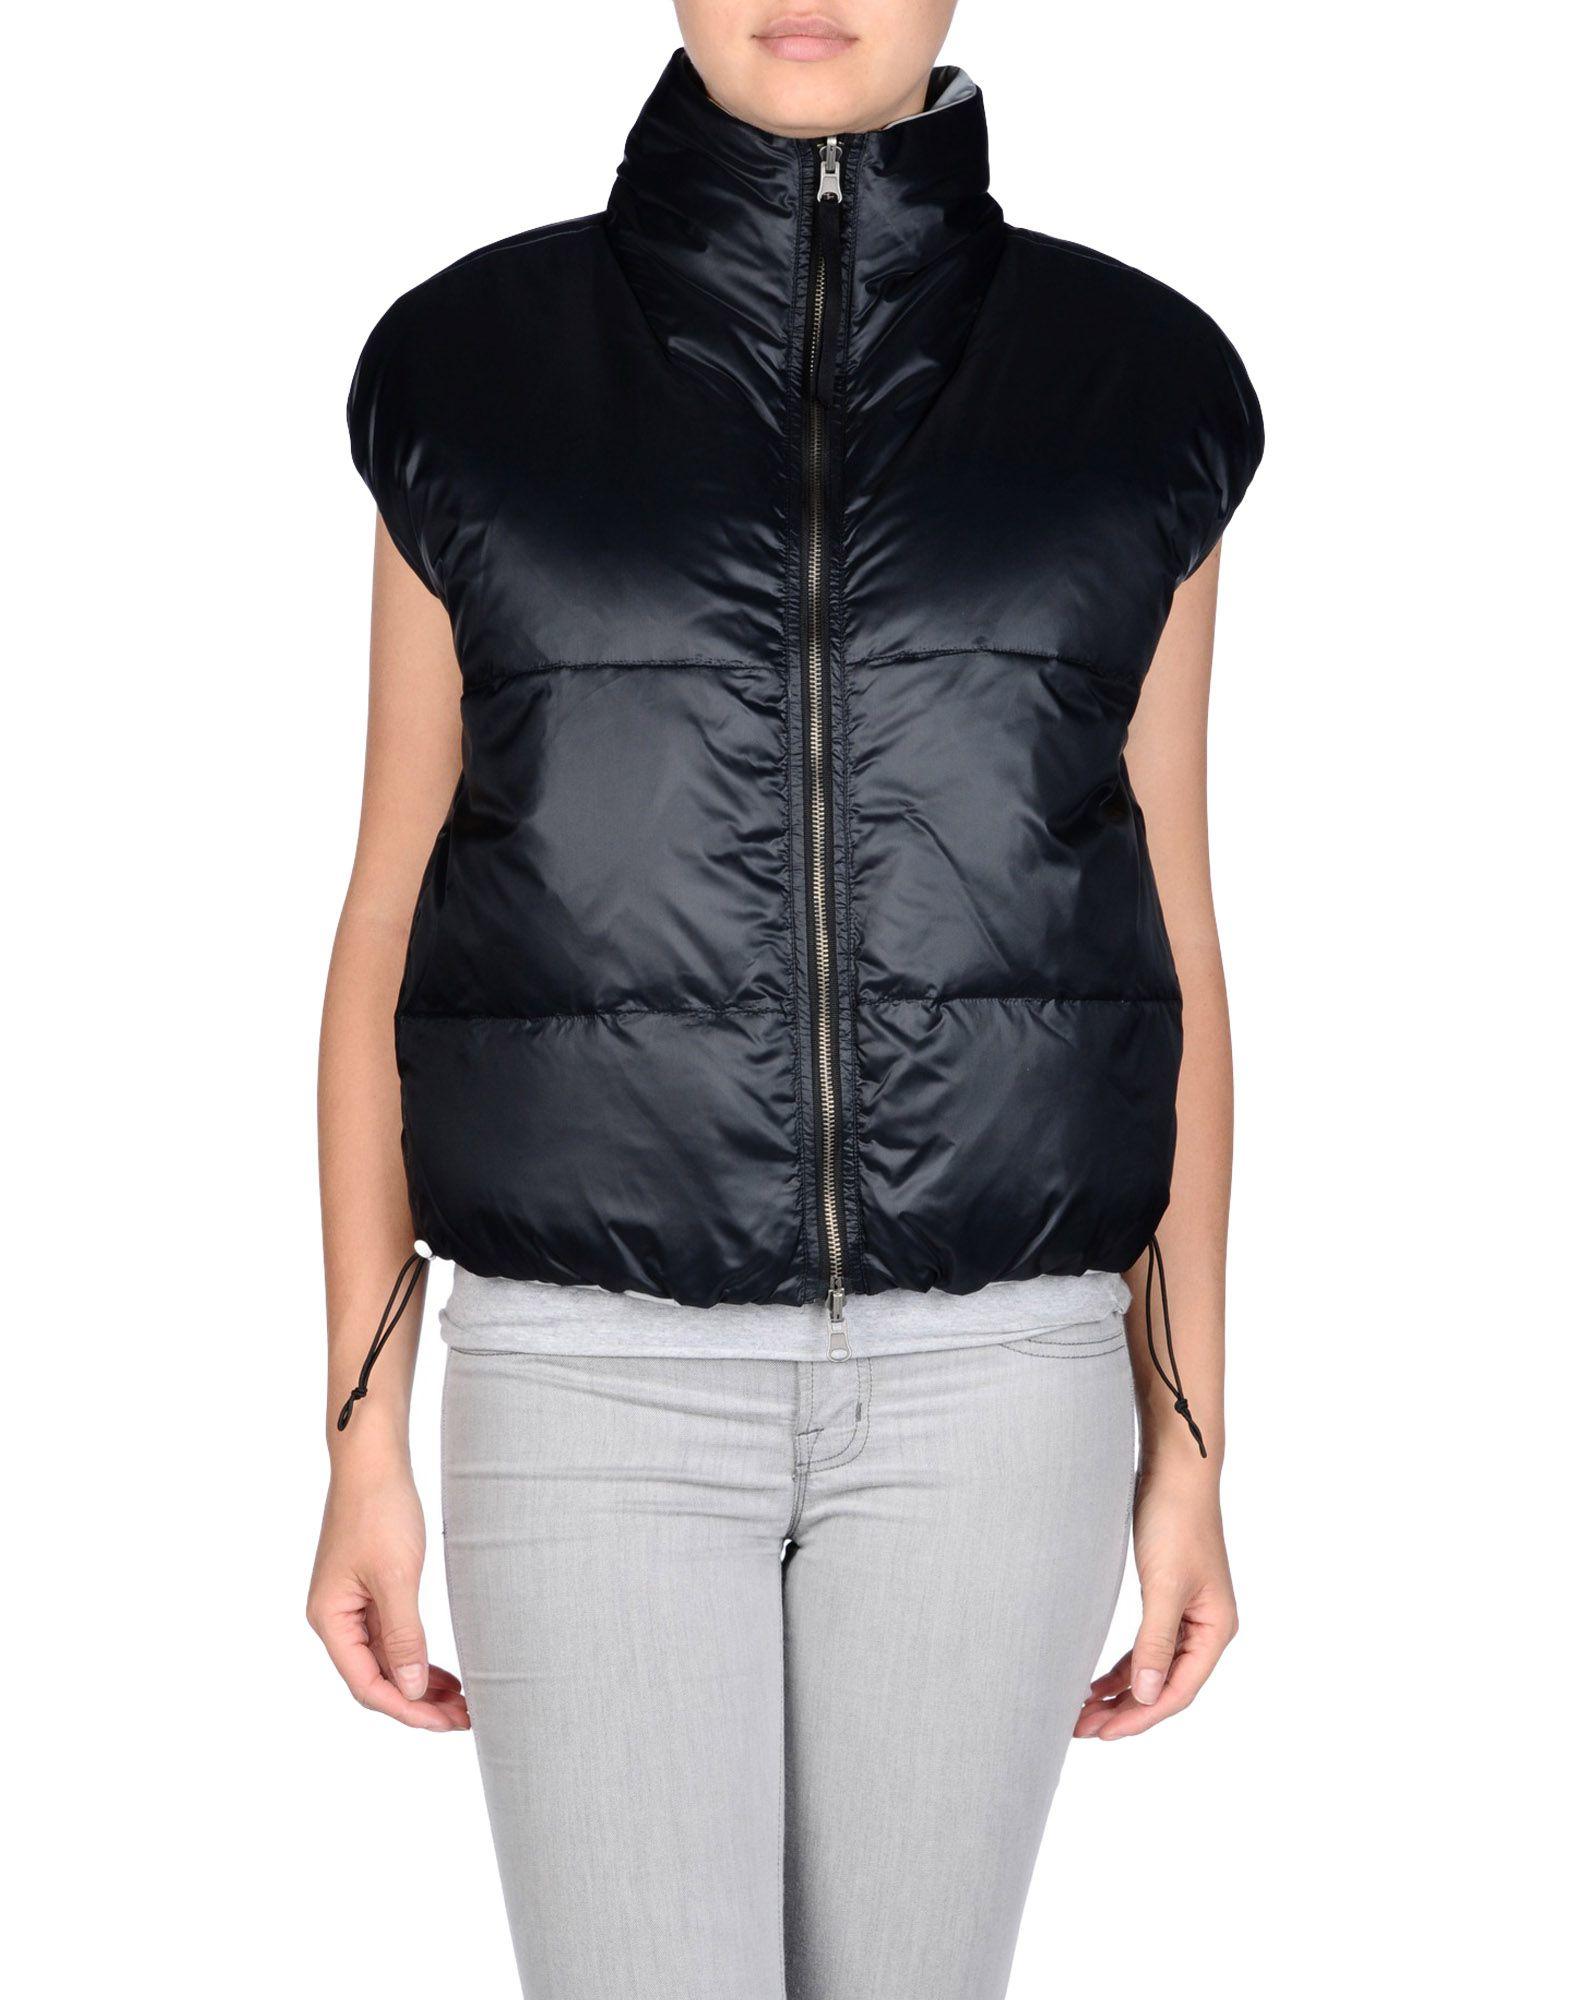 Lyst mm6 by maison martin margiela down jacket in black for Mm6 maison martin margiela